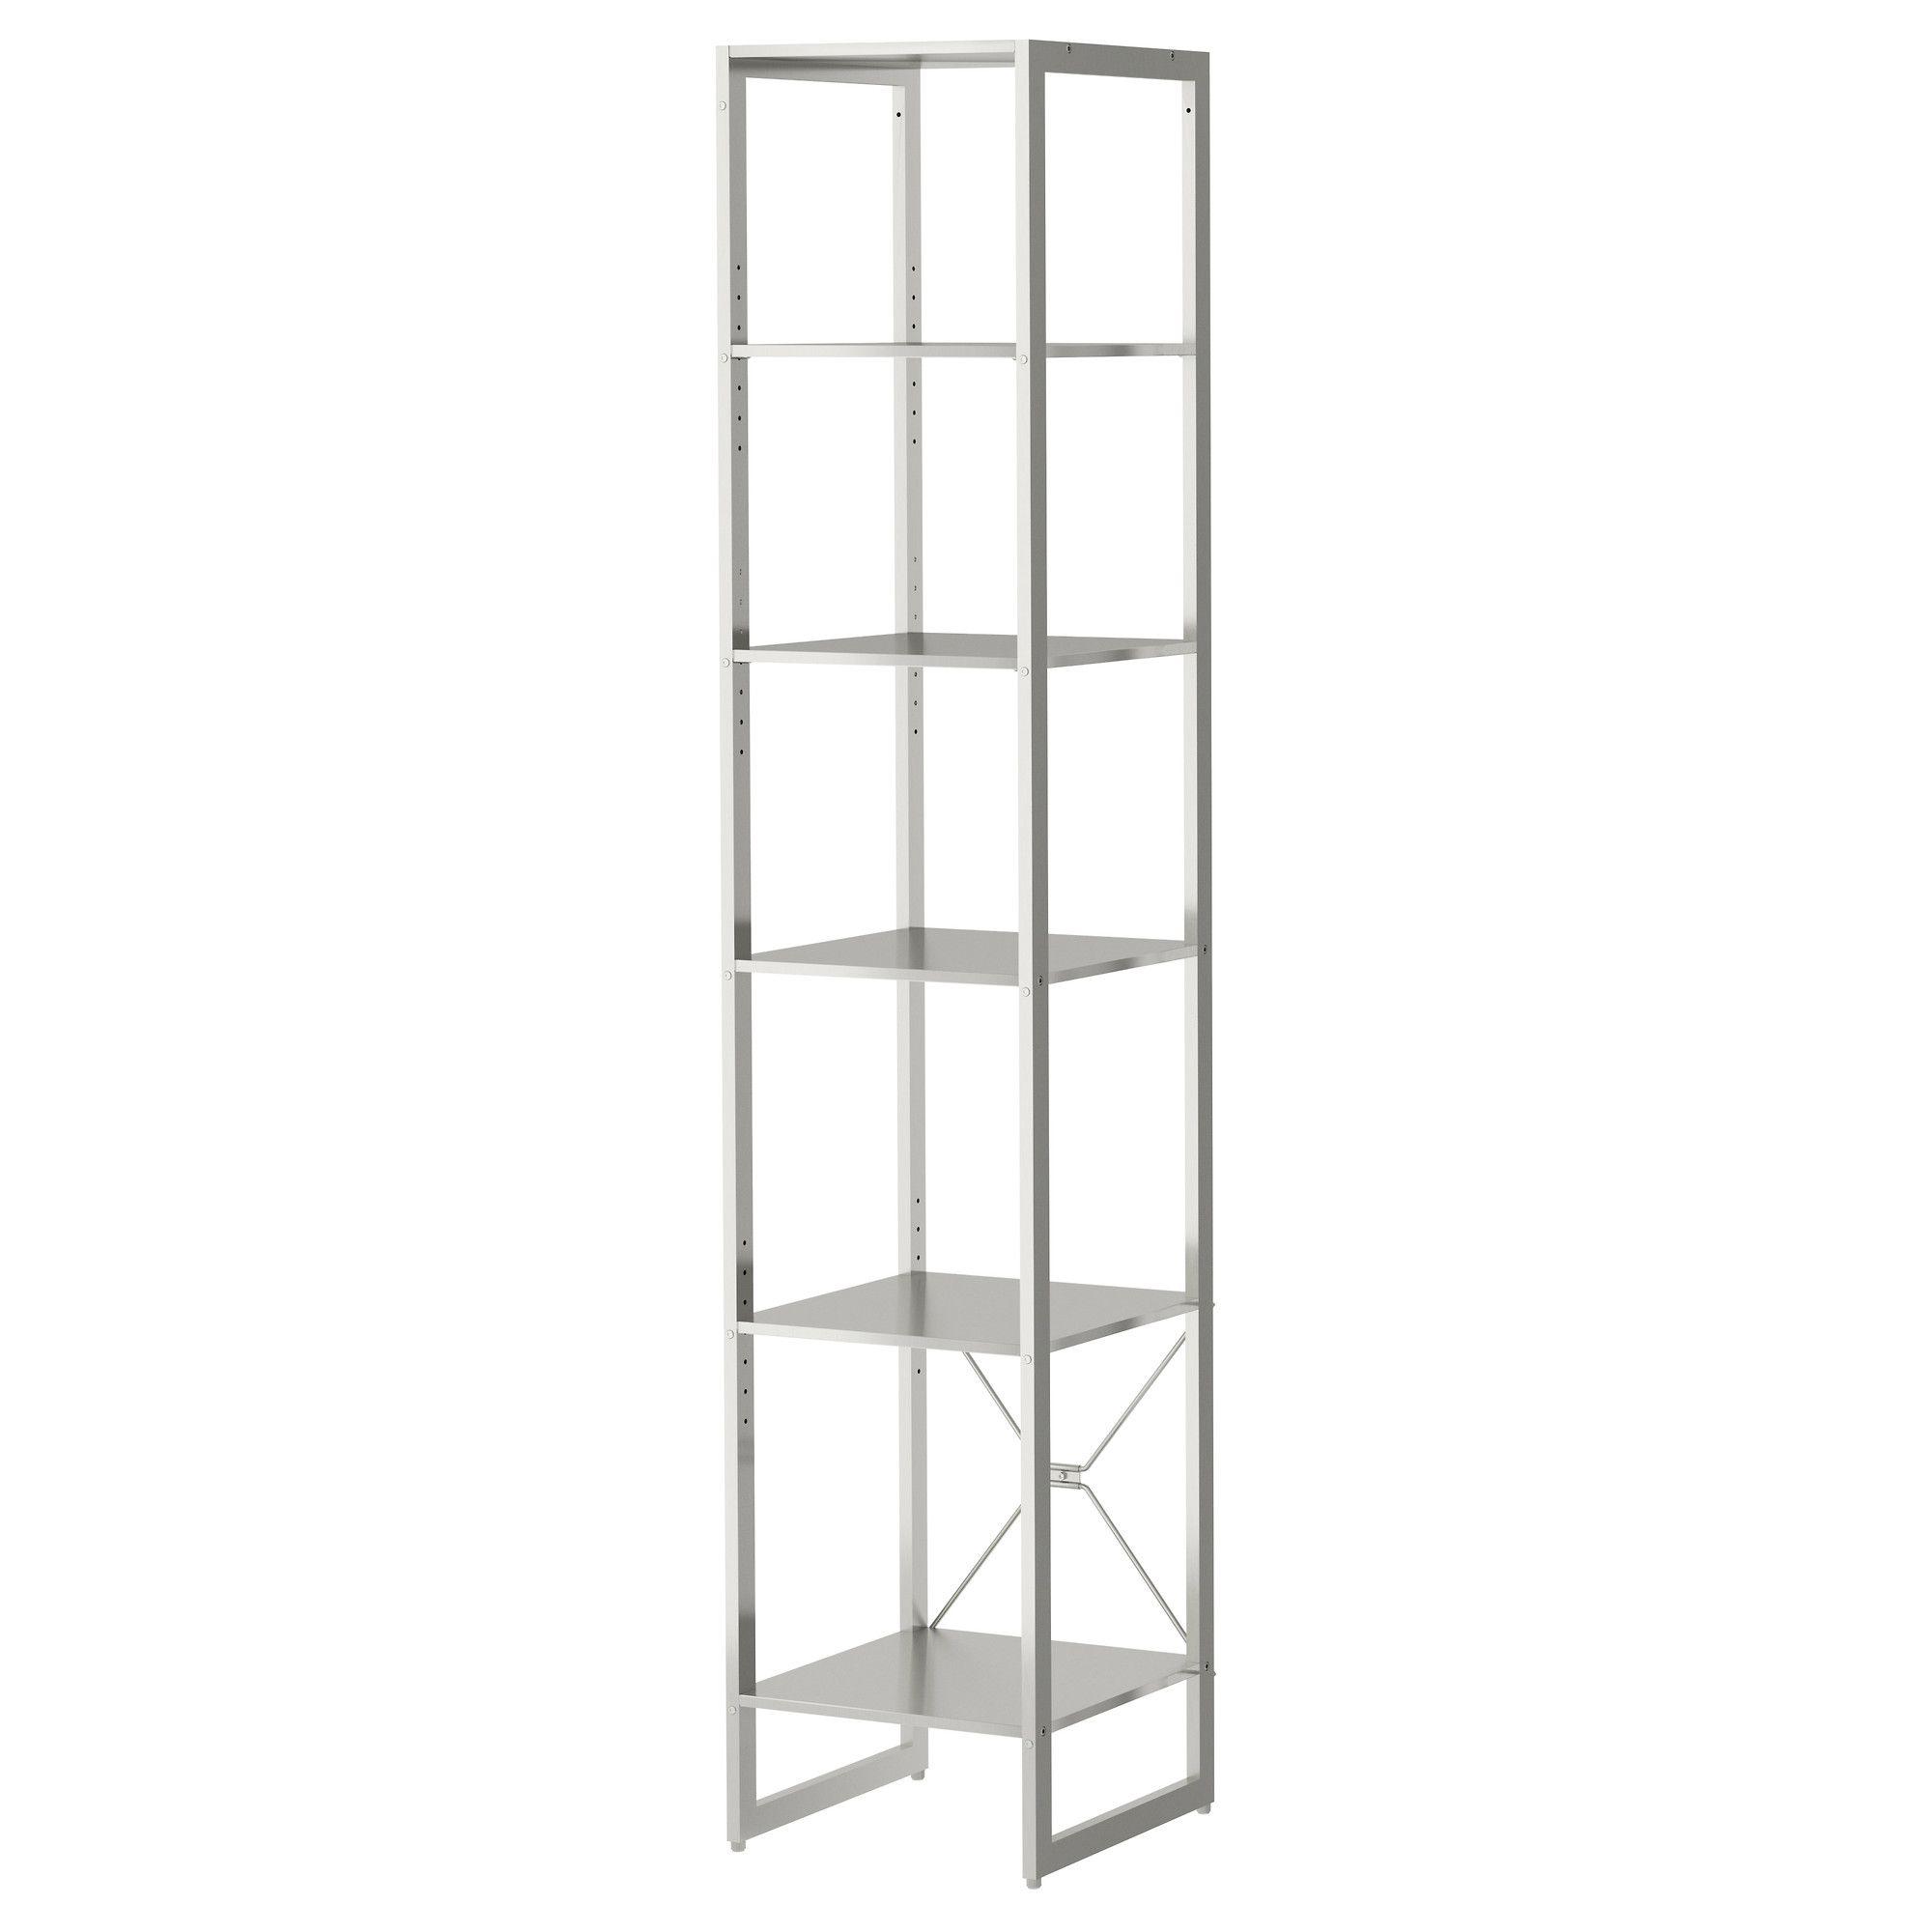 Us Furniture And Home Furnishings Ikea Shelving Unit